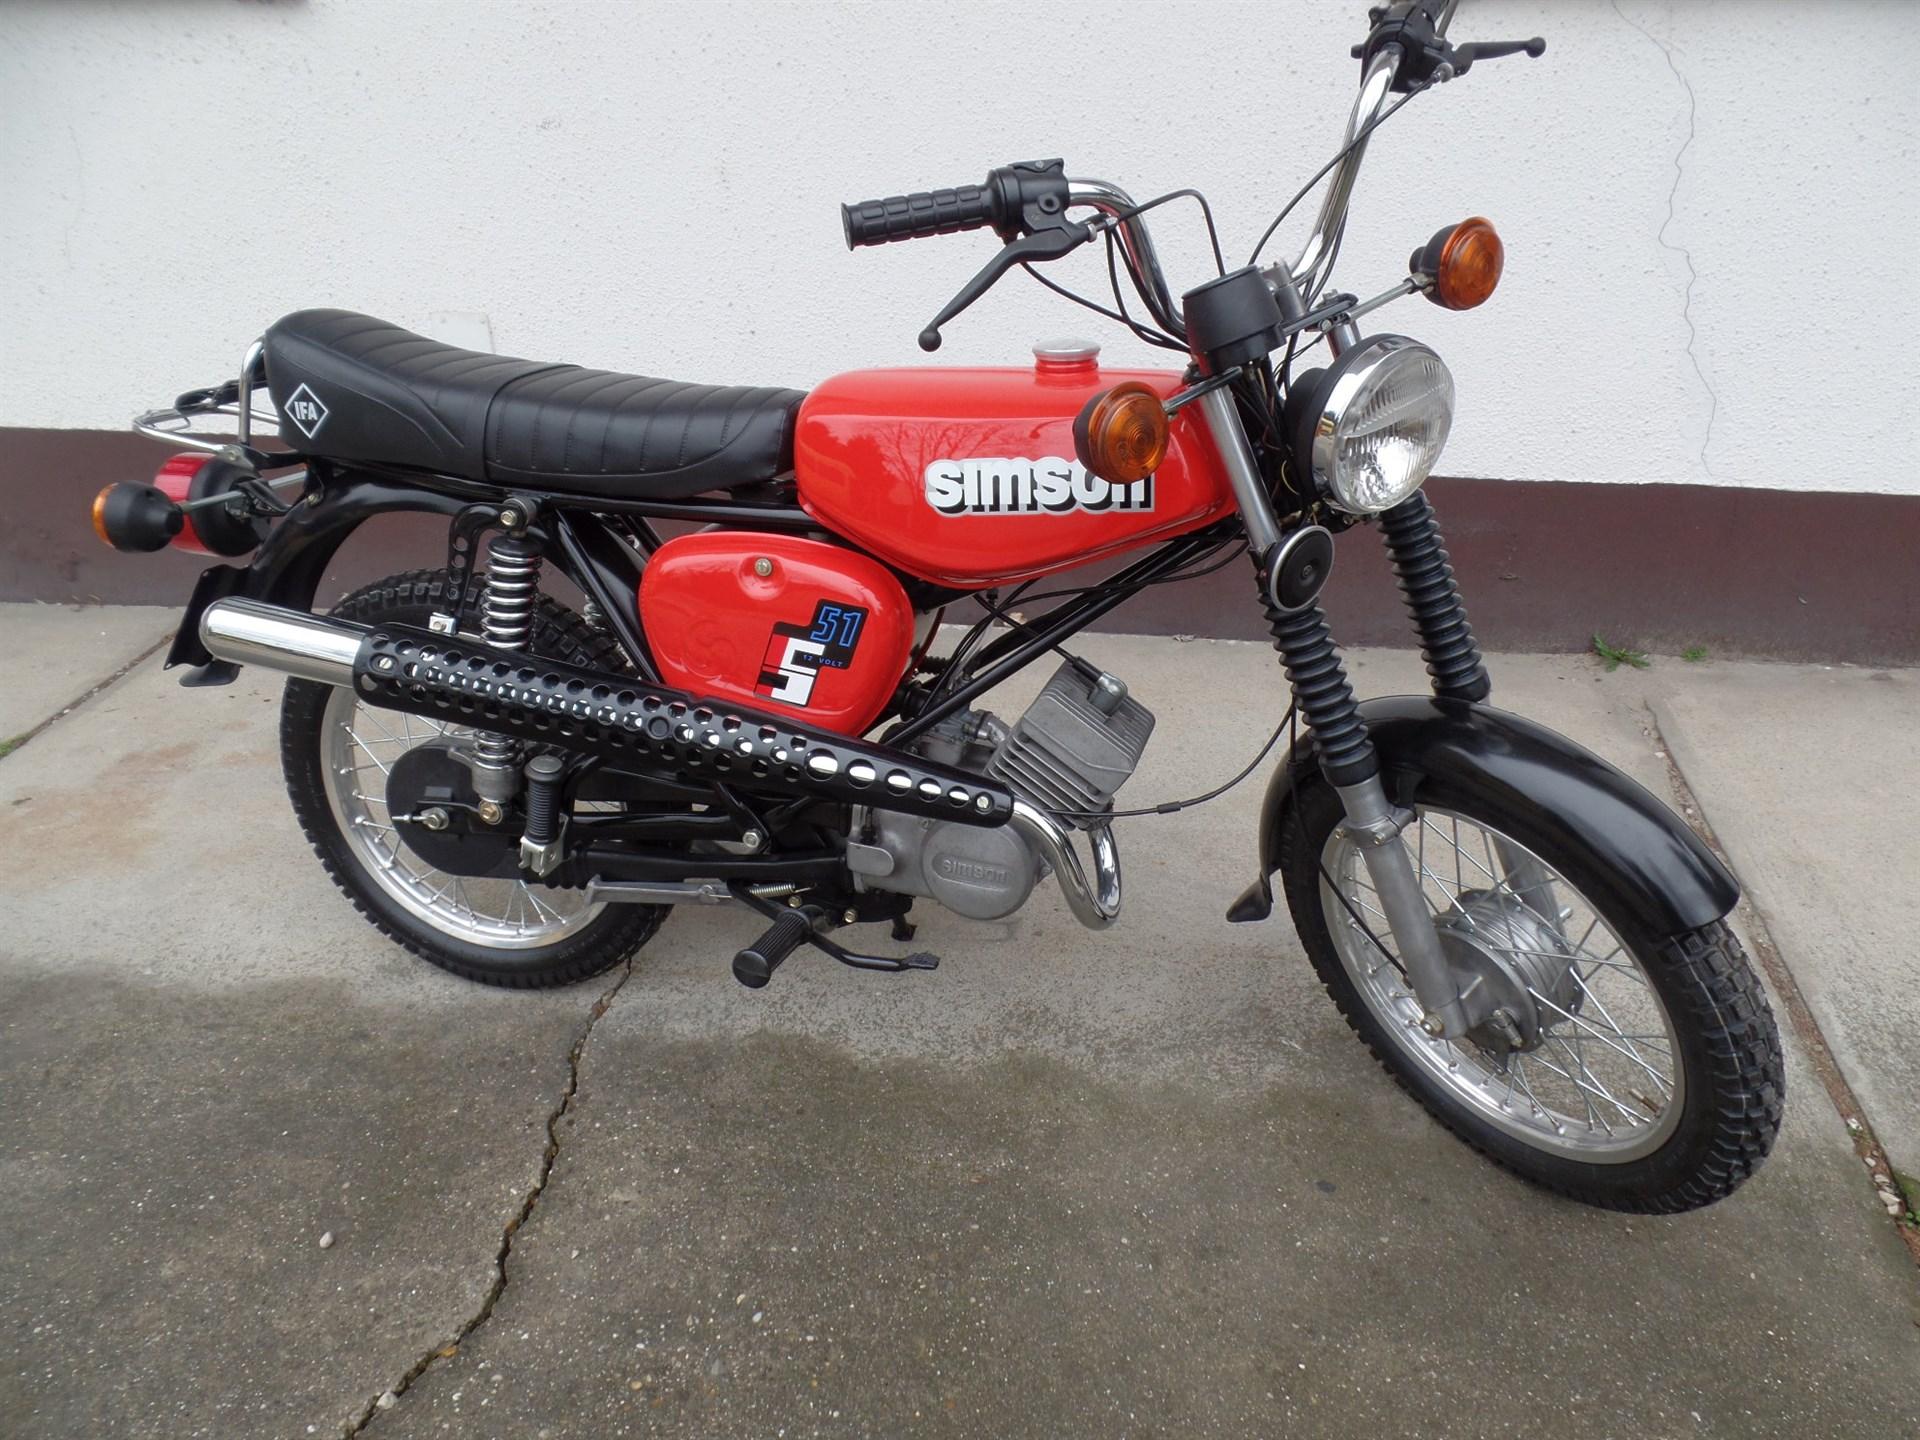 Simson Enduro S51/1E1